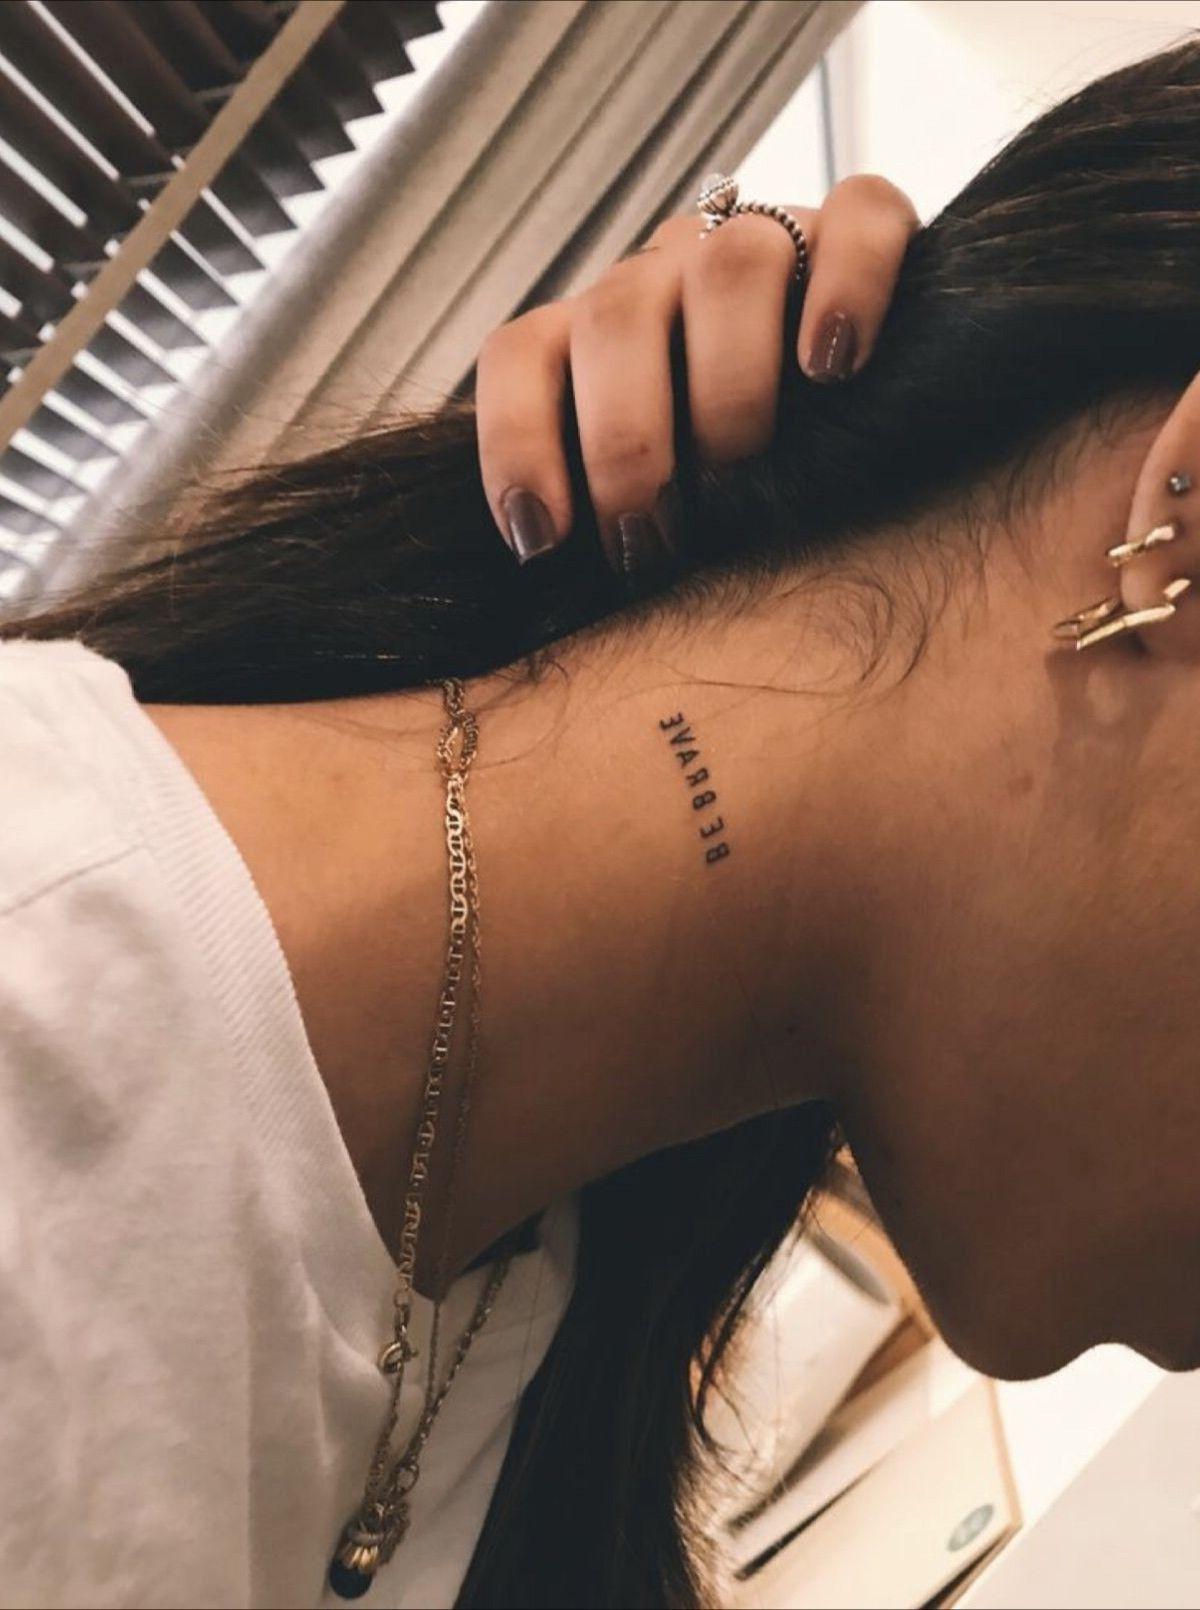 Pin De Olivia Miramontes En Tatu Tatuajes Pequenos Cuello Tatuajes Intimos Tatuajes Femeninos